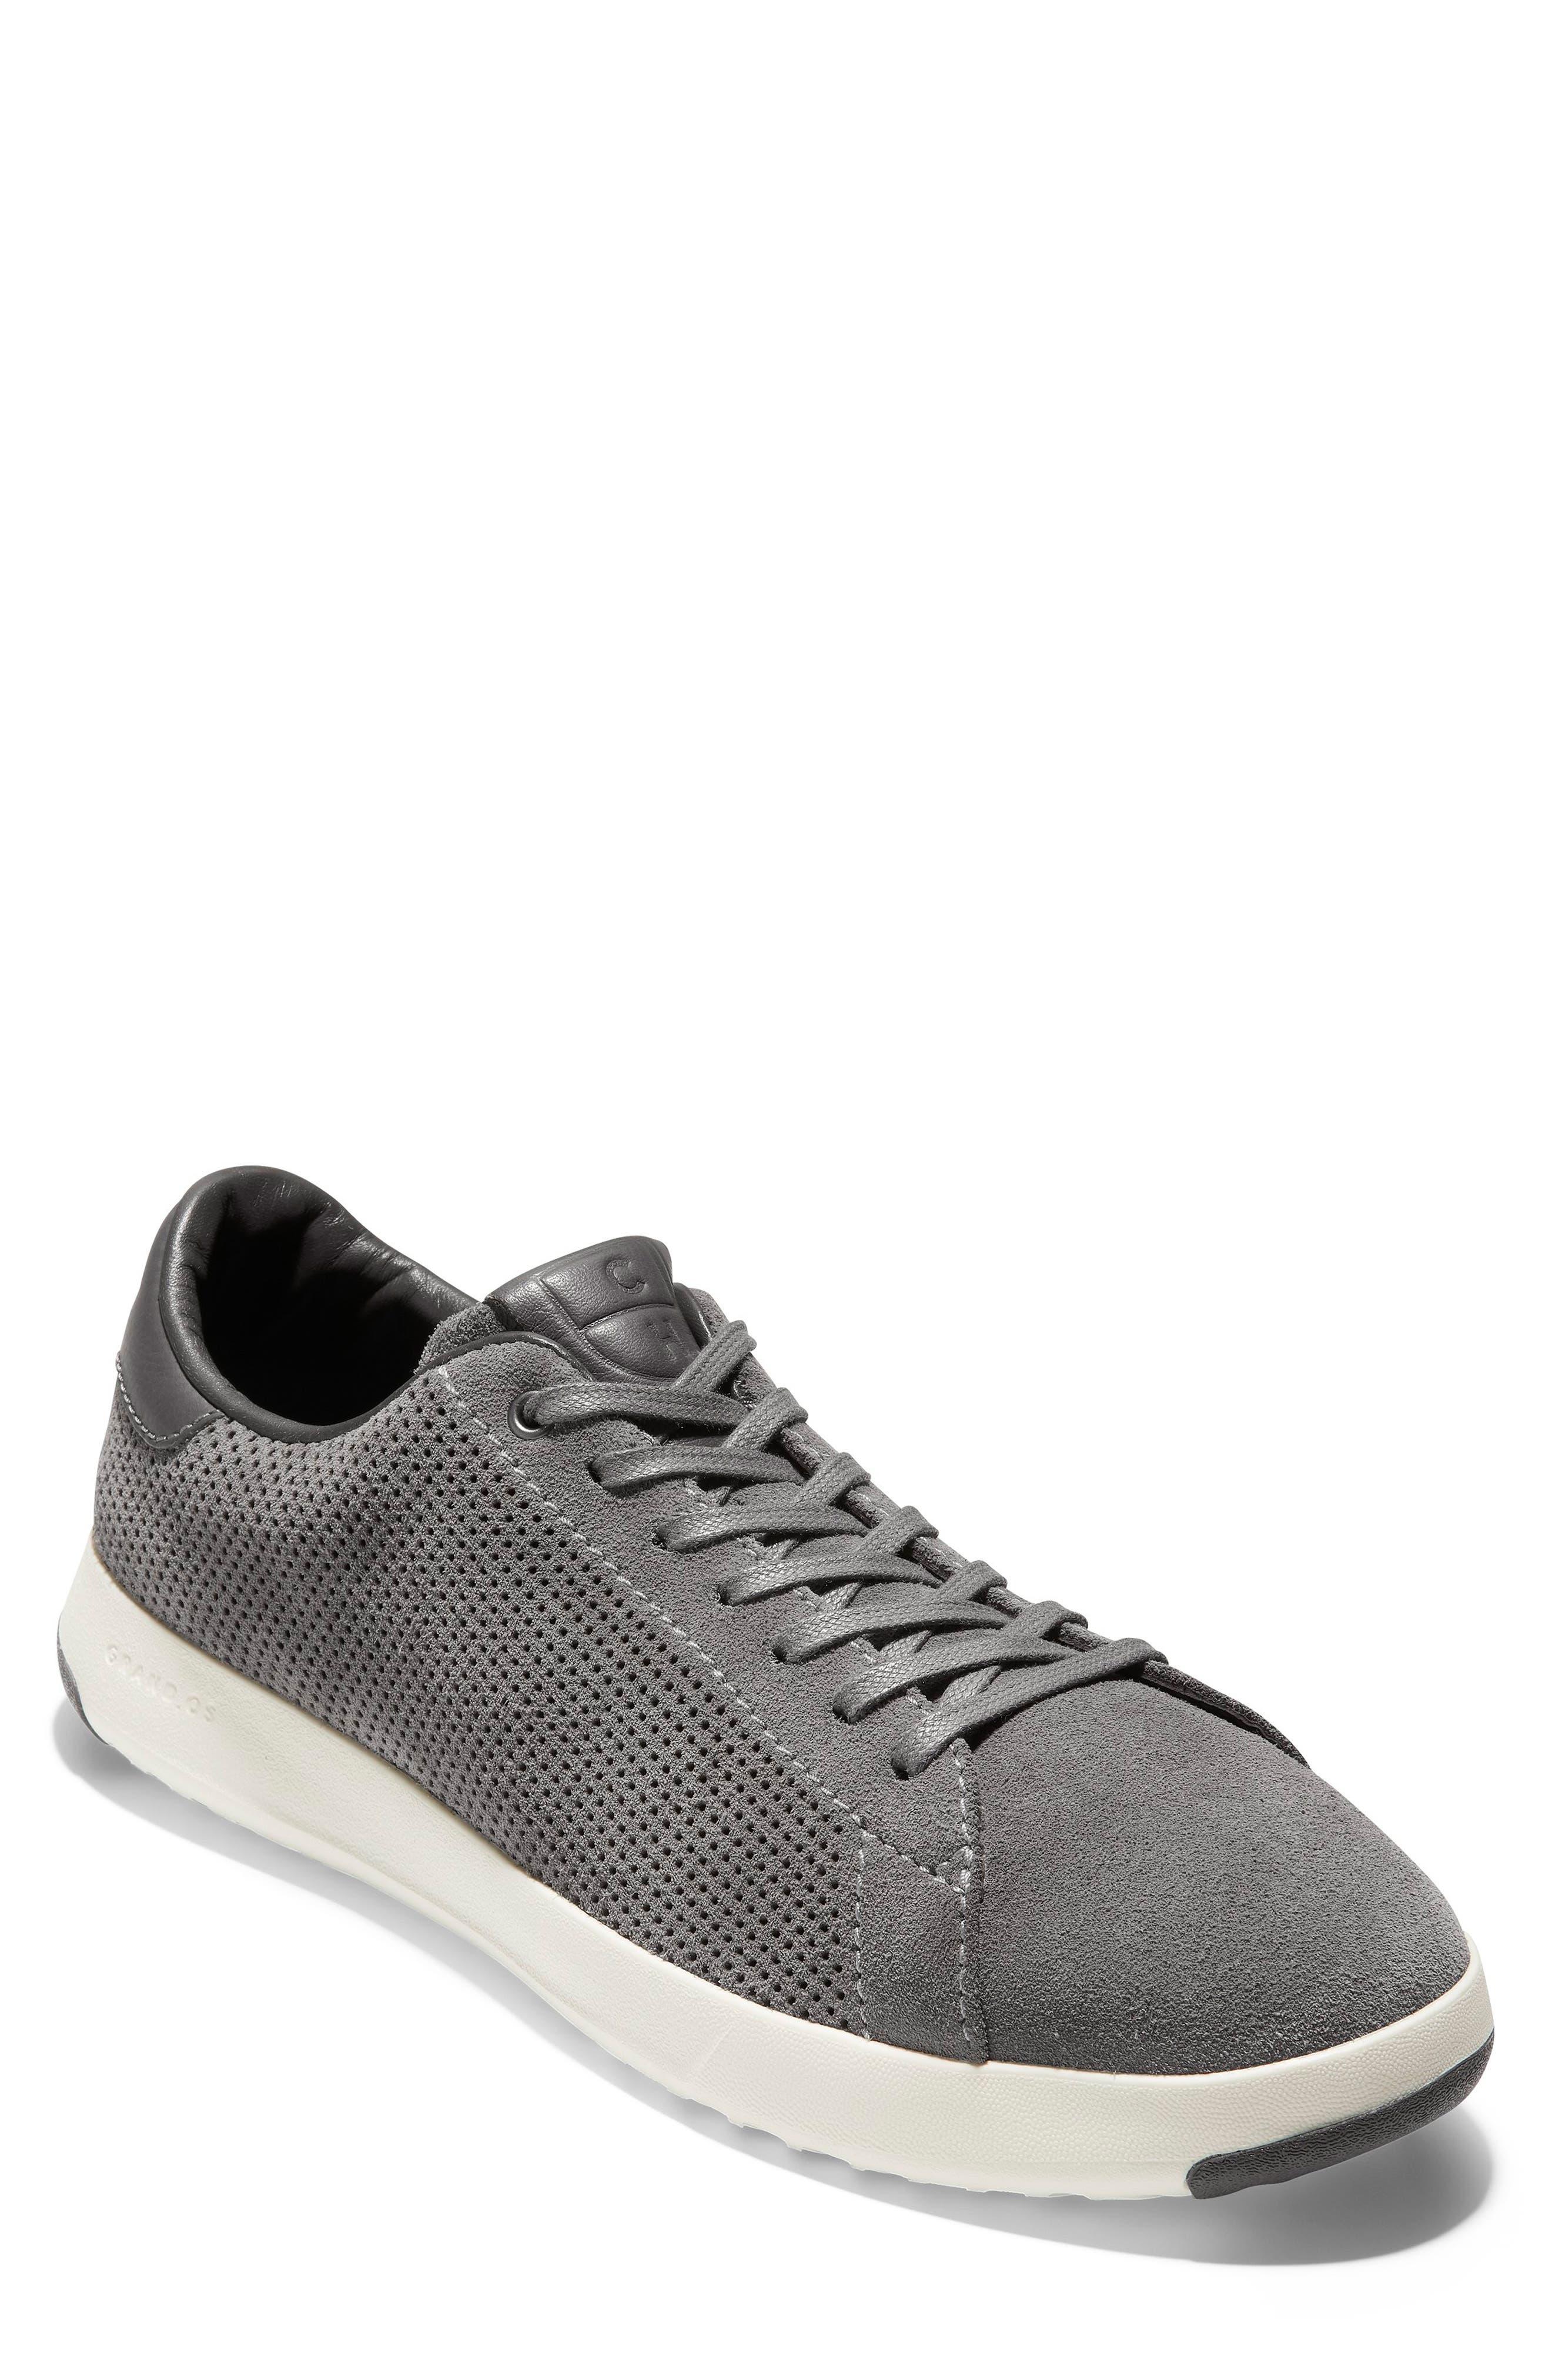 COLE HAAN, GrandPro Tennis Sneaker, Main thumbnail 1, color, GREY SUEDE